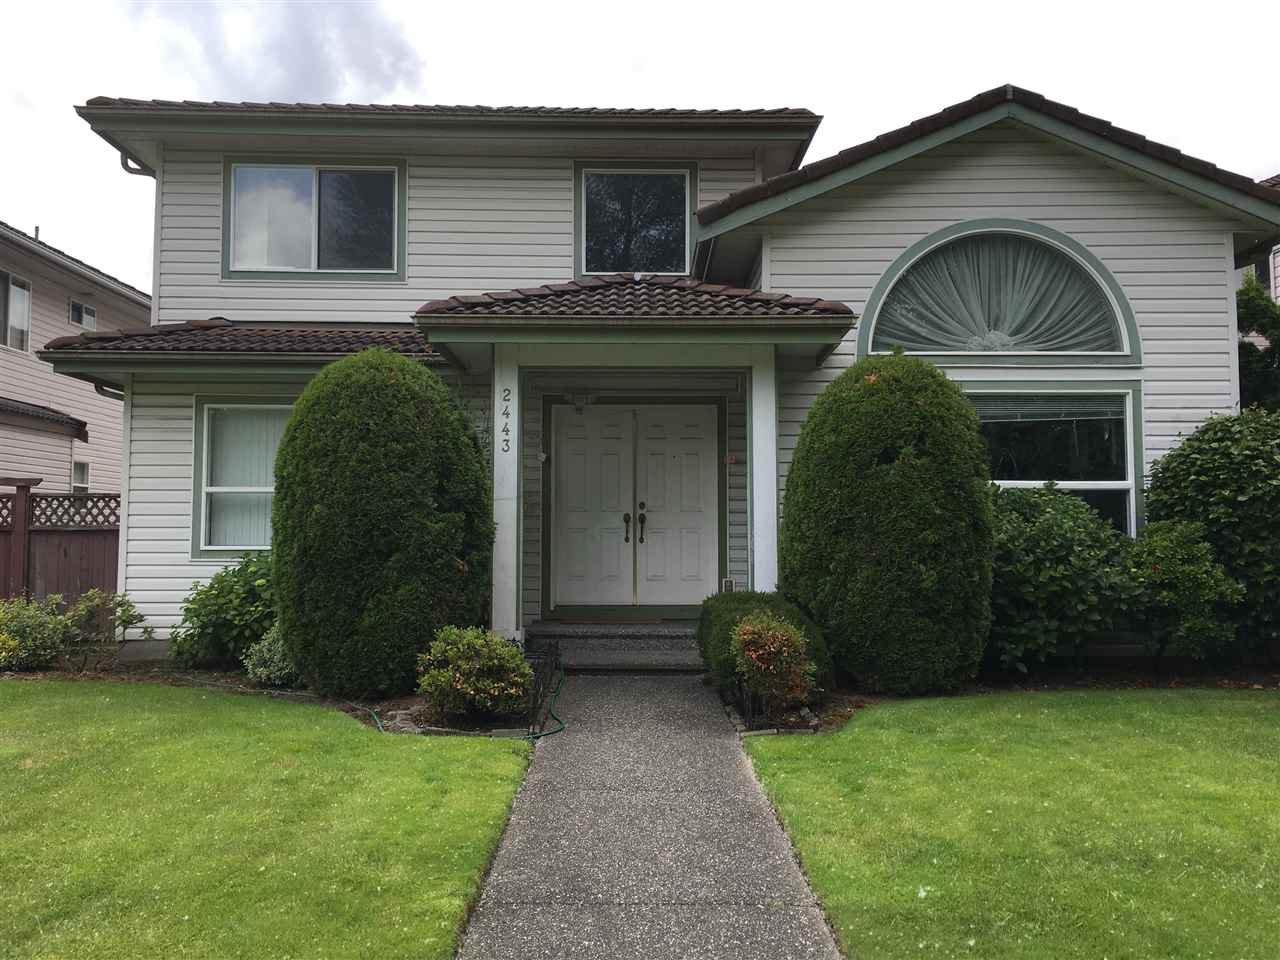 Main Photo: 2443 OTTAWA Street in Port Coquitlam: Riverwood House for sale : MLS®# R2465279